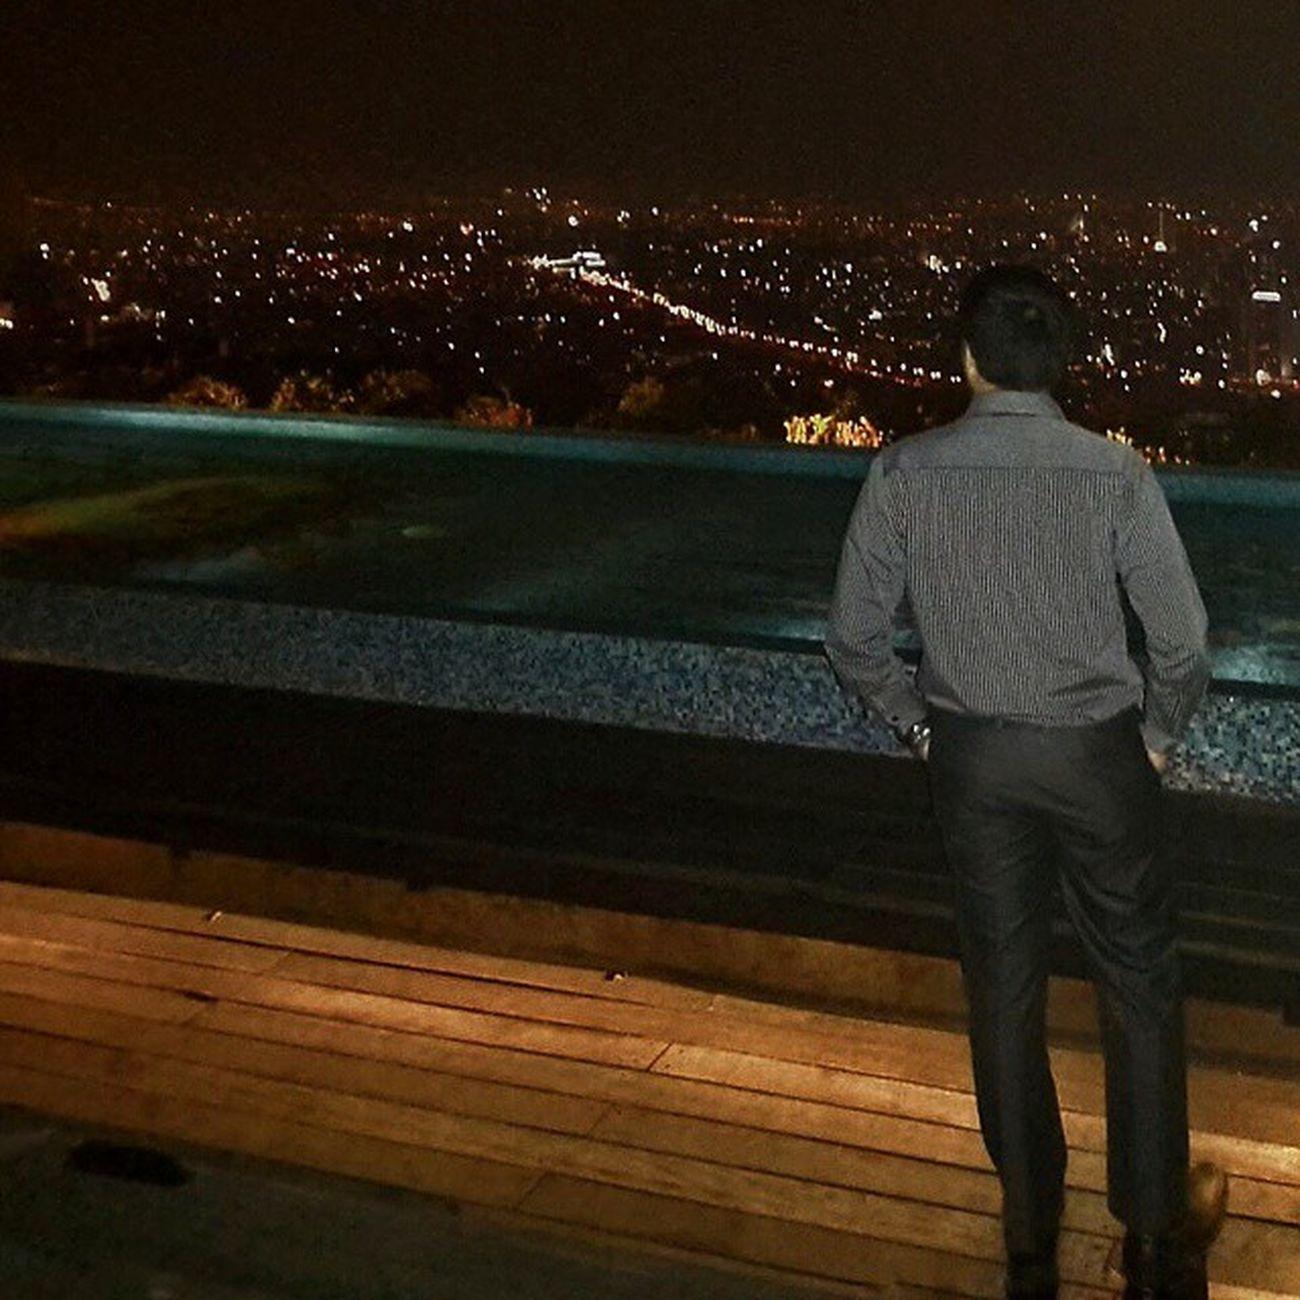 Where's Ana 😔 Jakarta @nightSkye Rooftop Skyejakarta 56thfloor Pictoftheday Dagelan VSCO Mr Grey City Building Skyporn Love Friday Sky Lounge Bar Star Instasky Pool Indonesiafamous Tgif